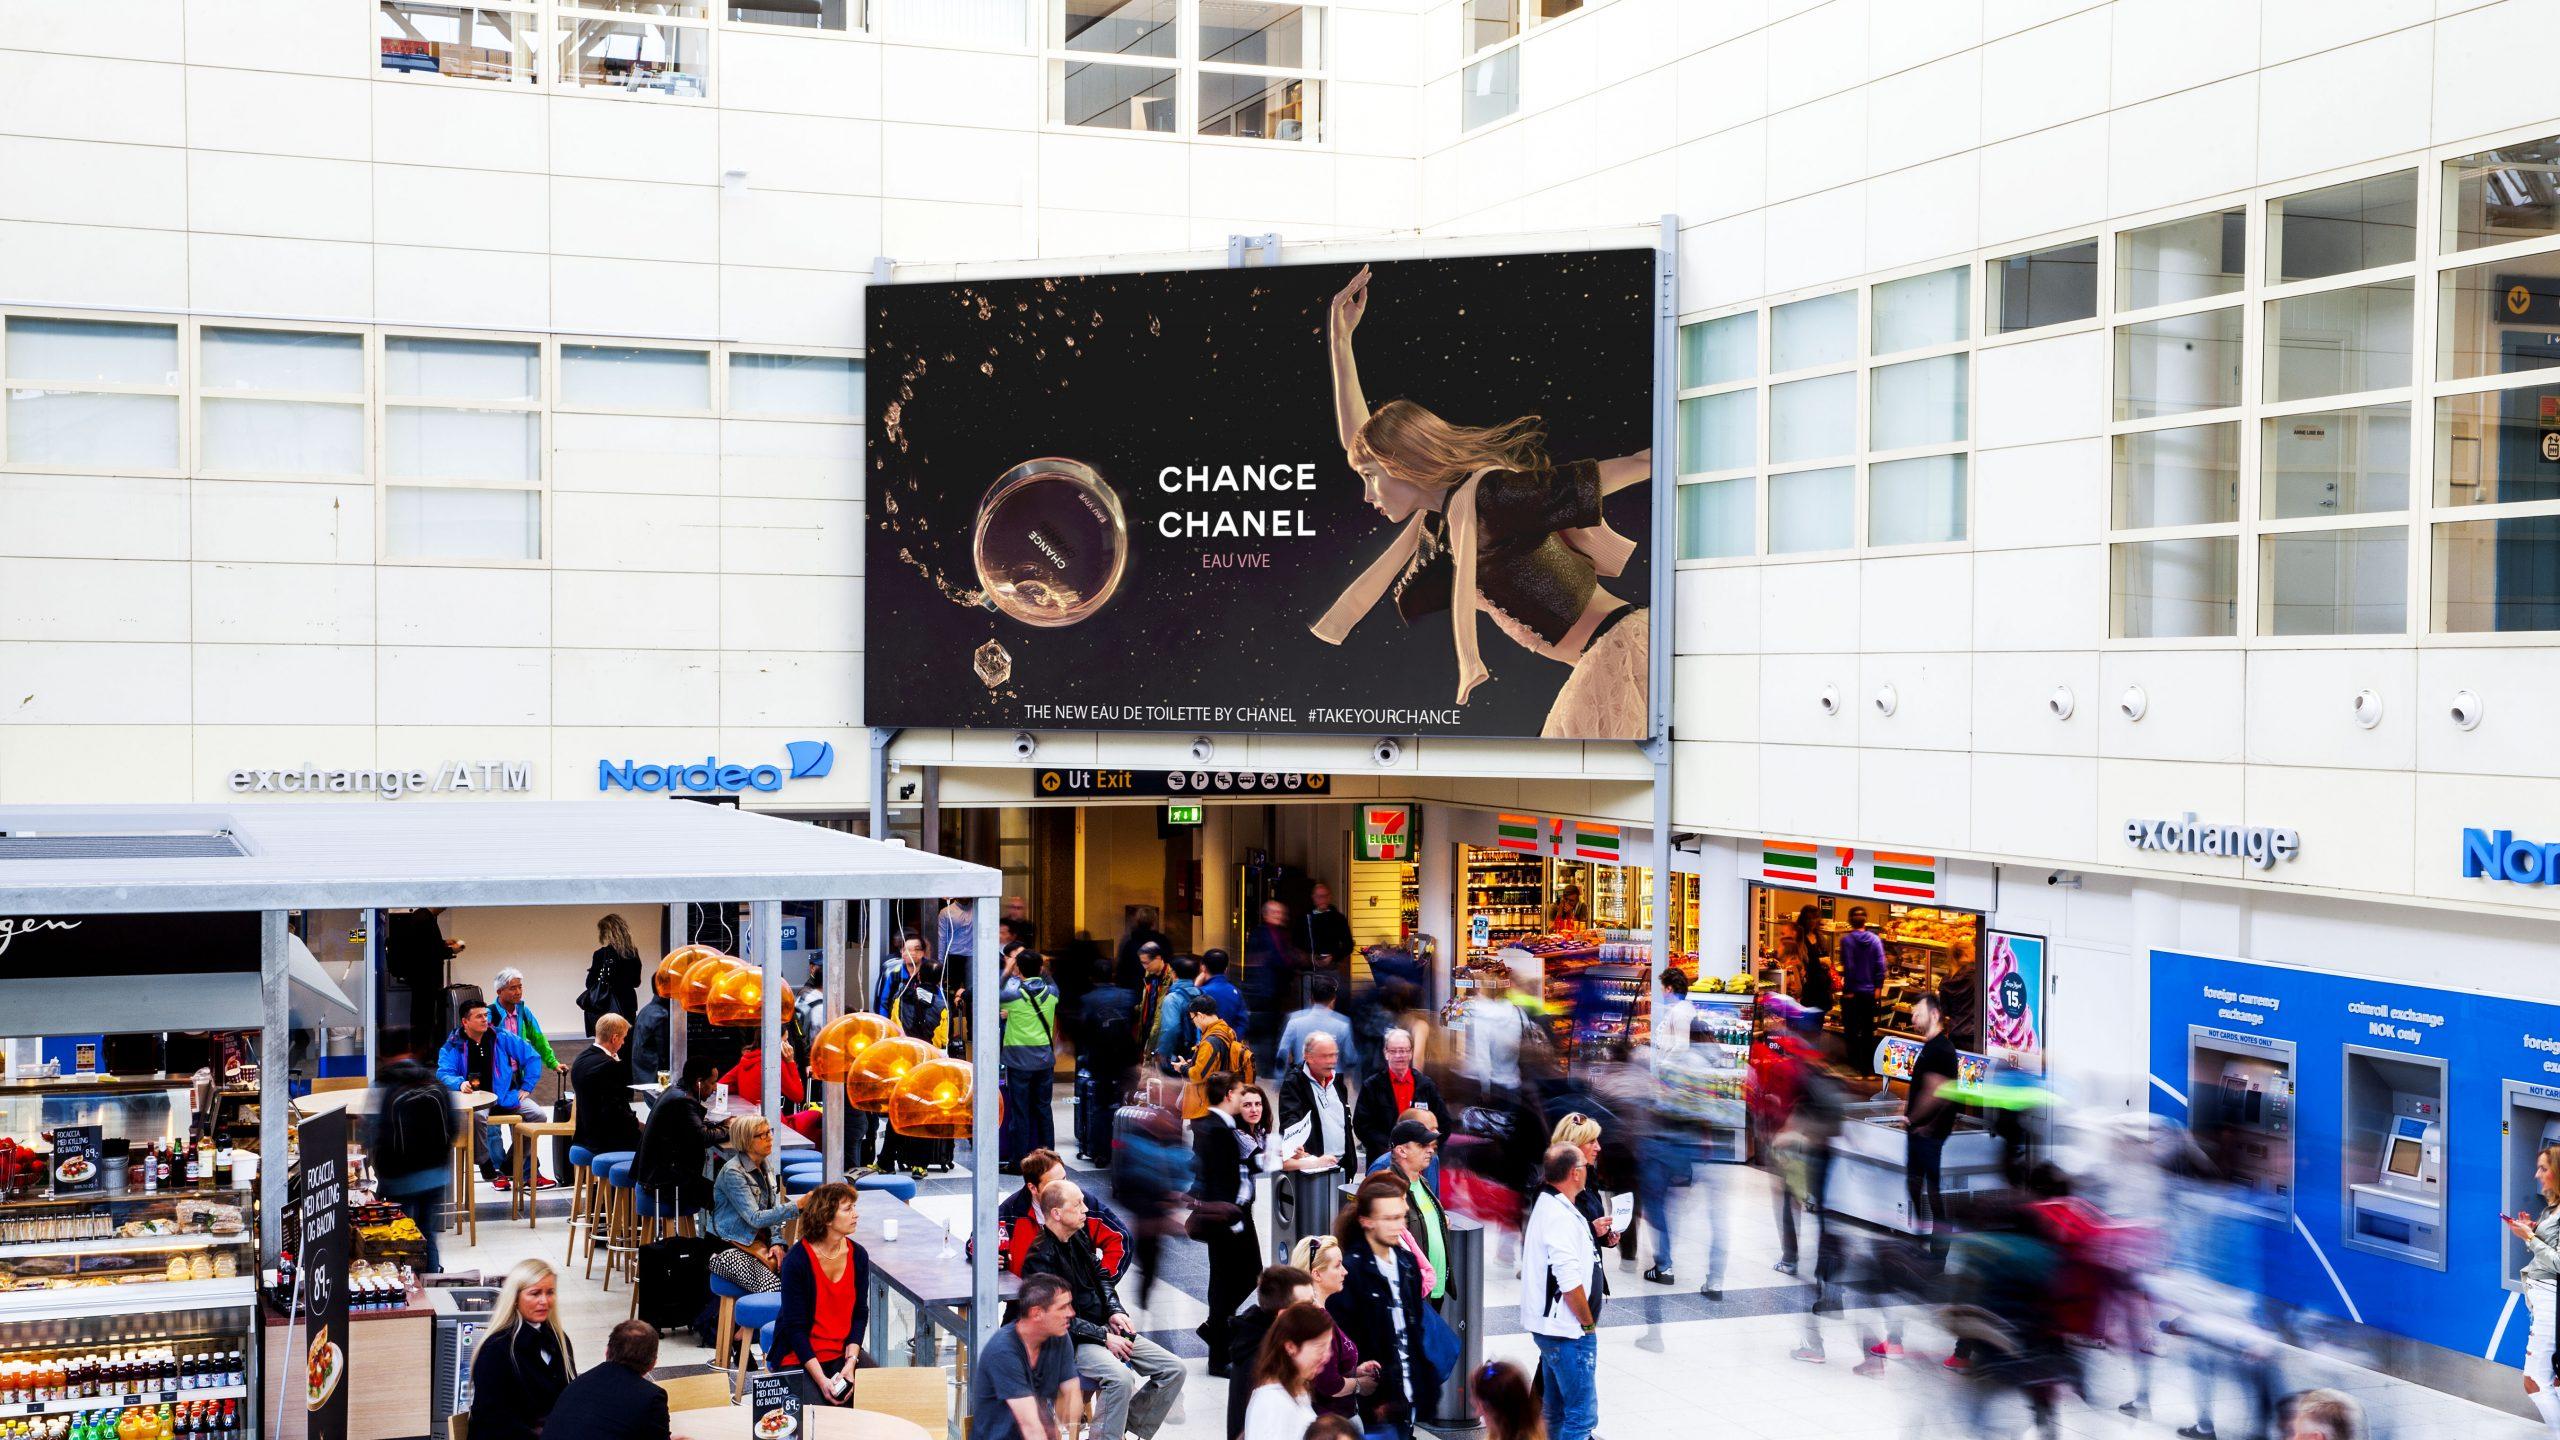 chanel-big-screen-bgo-flesland.jpg